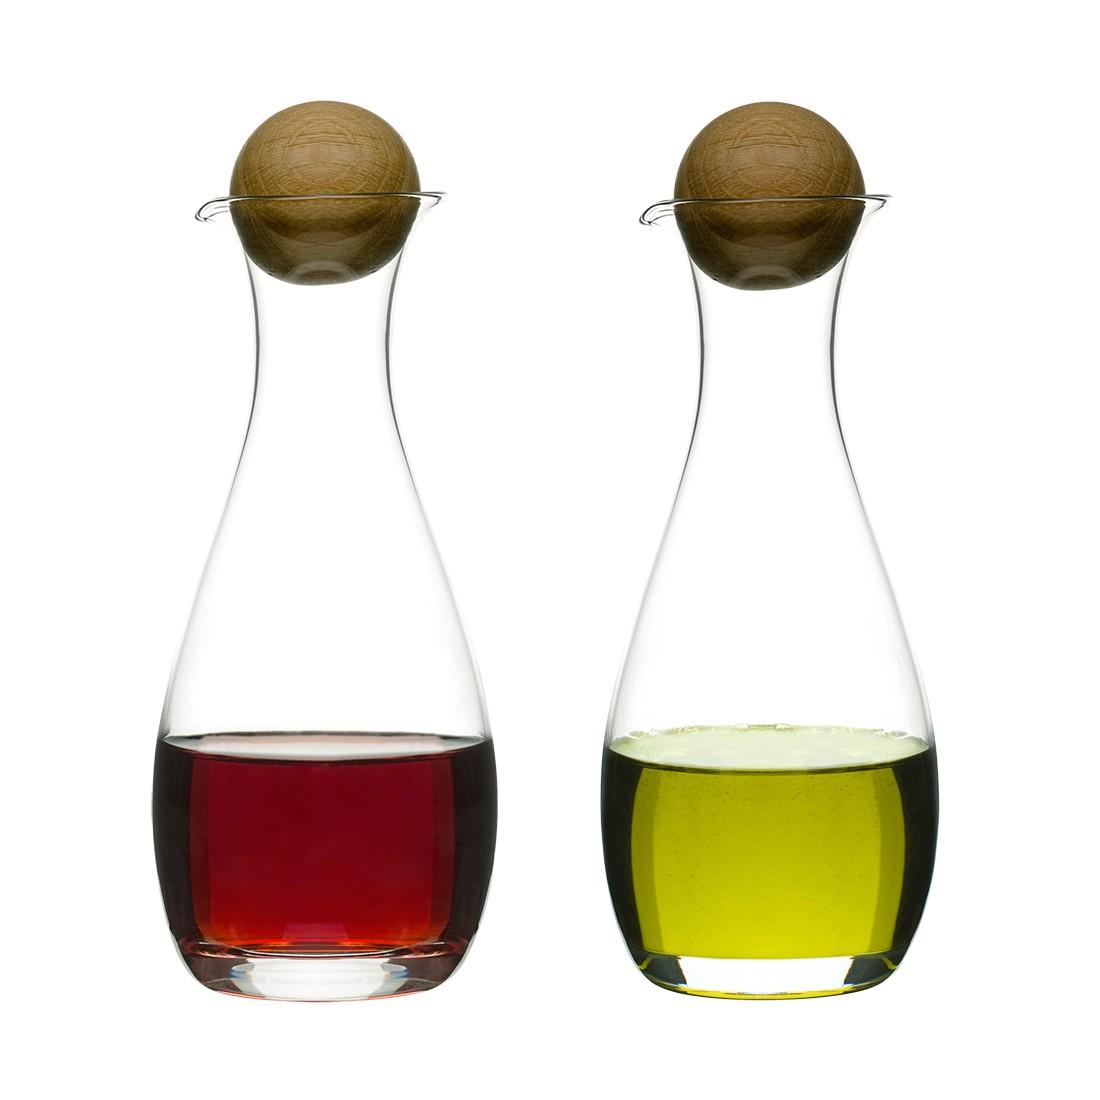 Essig- und Ölset Oval Oak 2 tlg. – Glas, Eichenholz Transparent, Holz, Sagaform bestellen